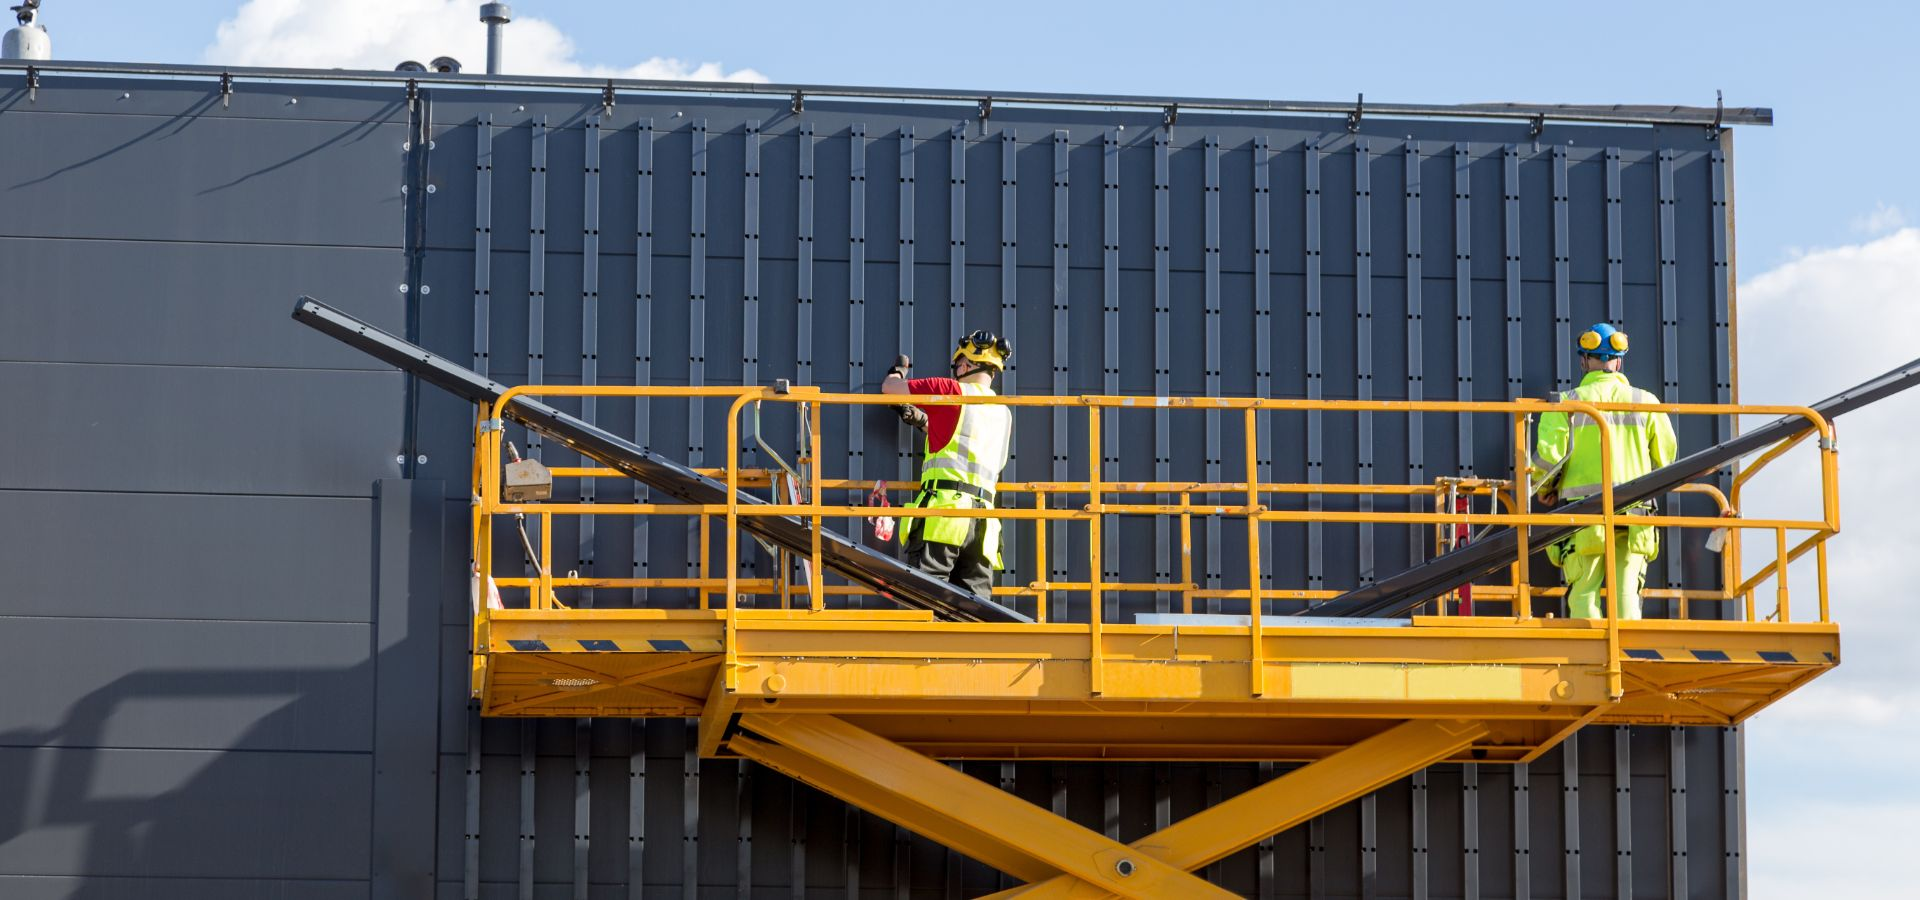 high level access equipment